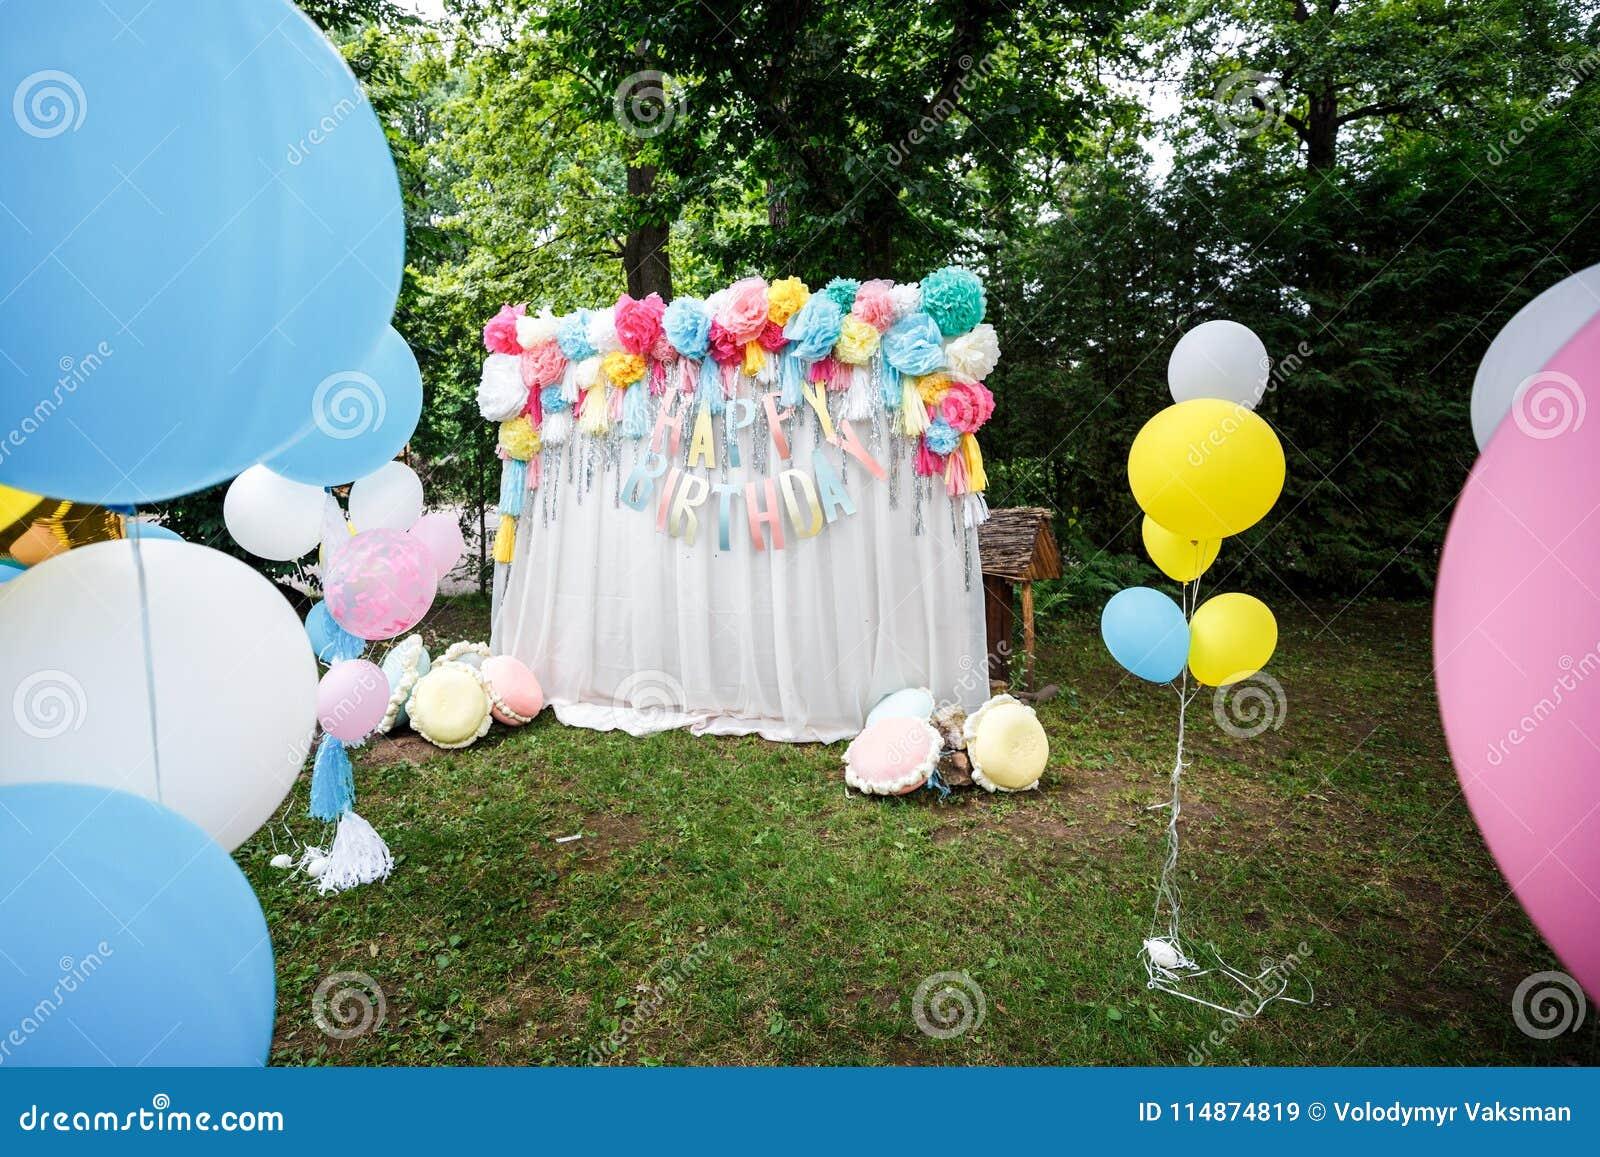 Birthday party decor balloons